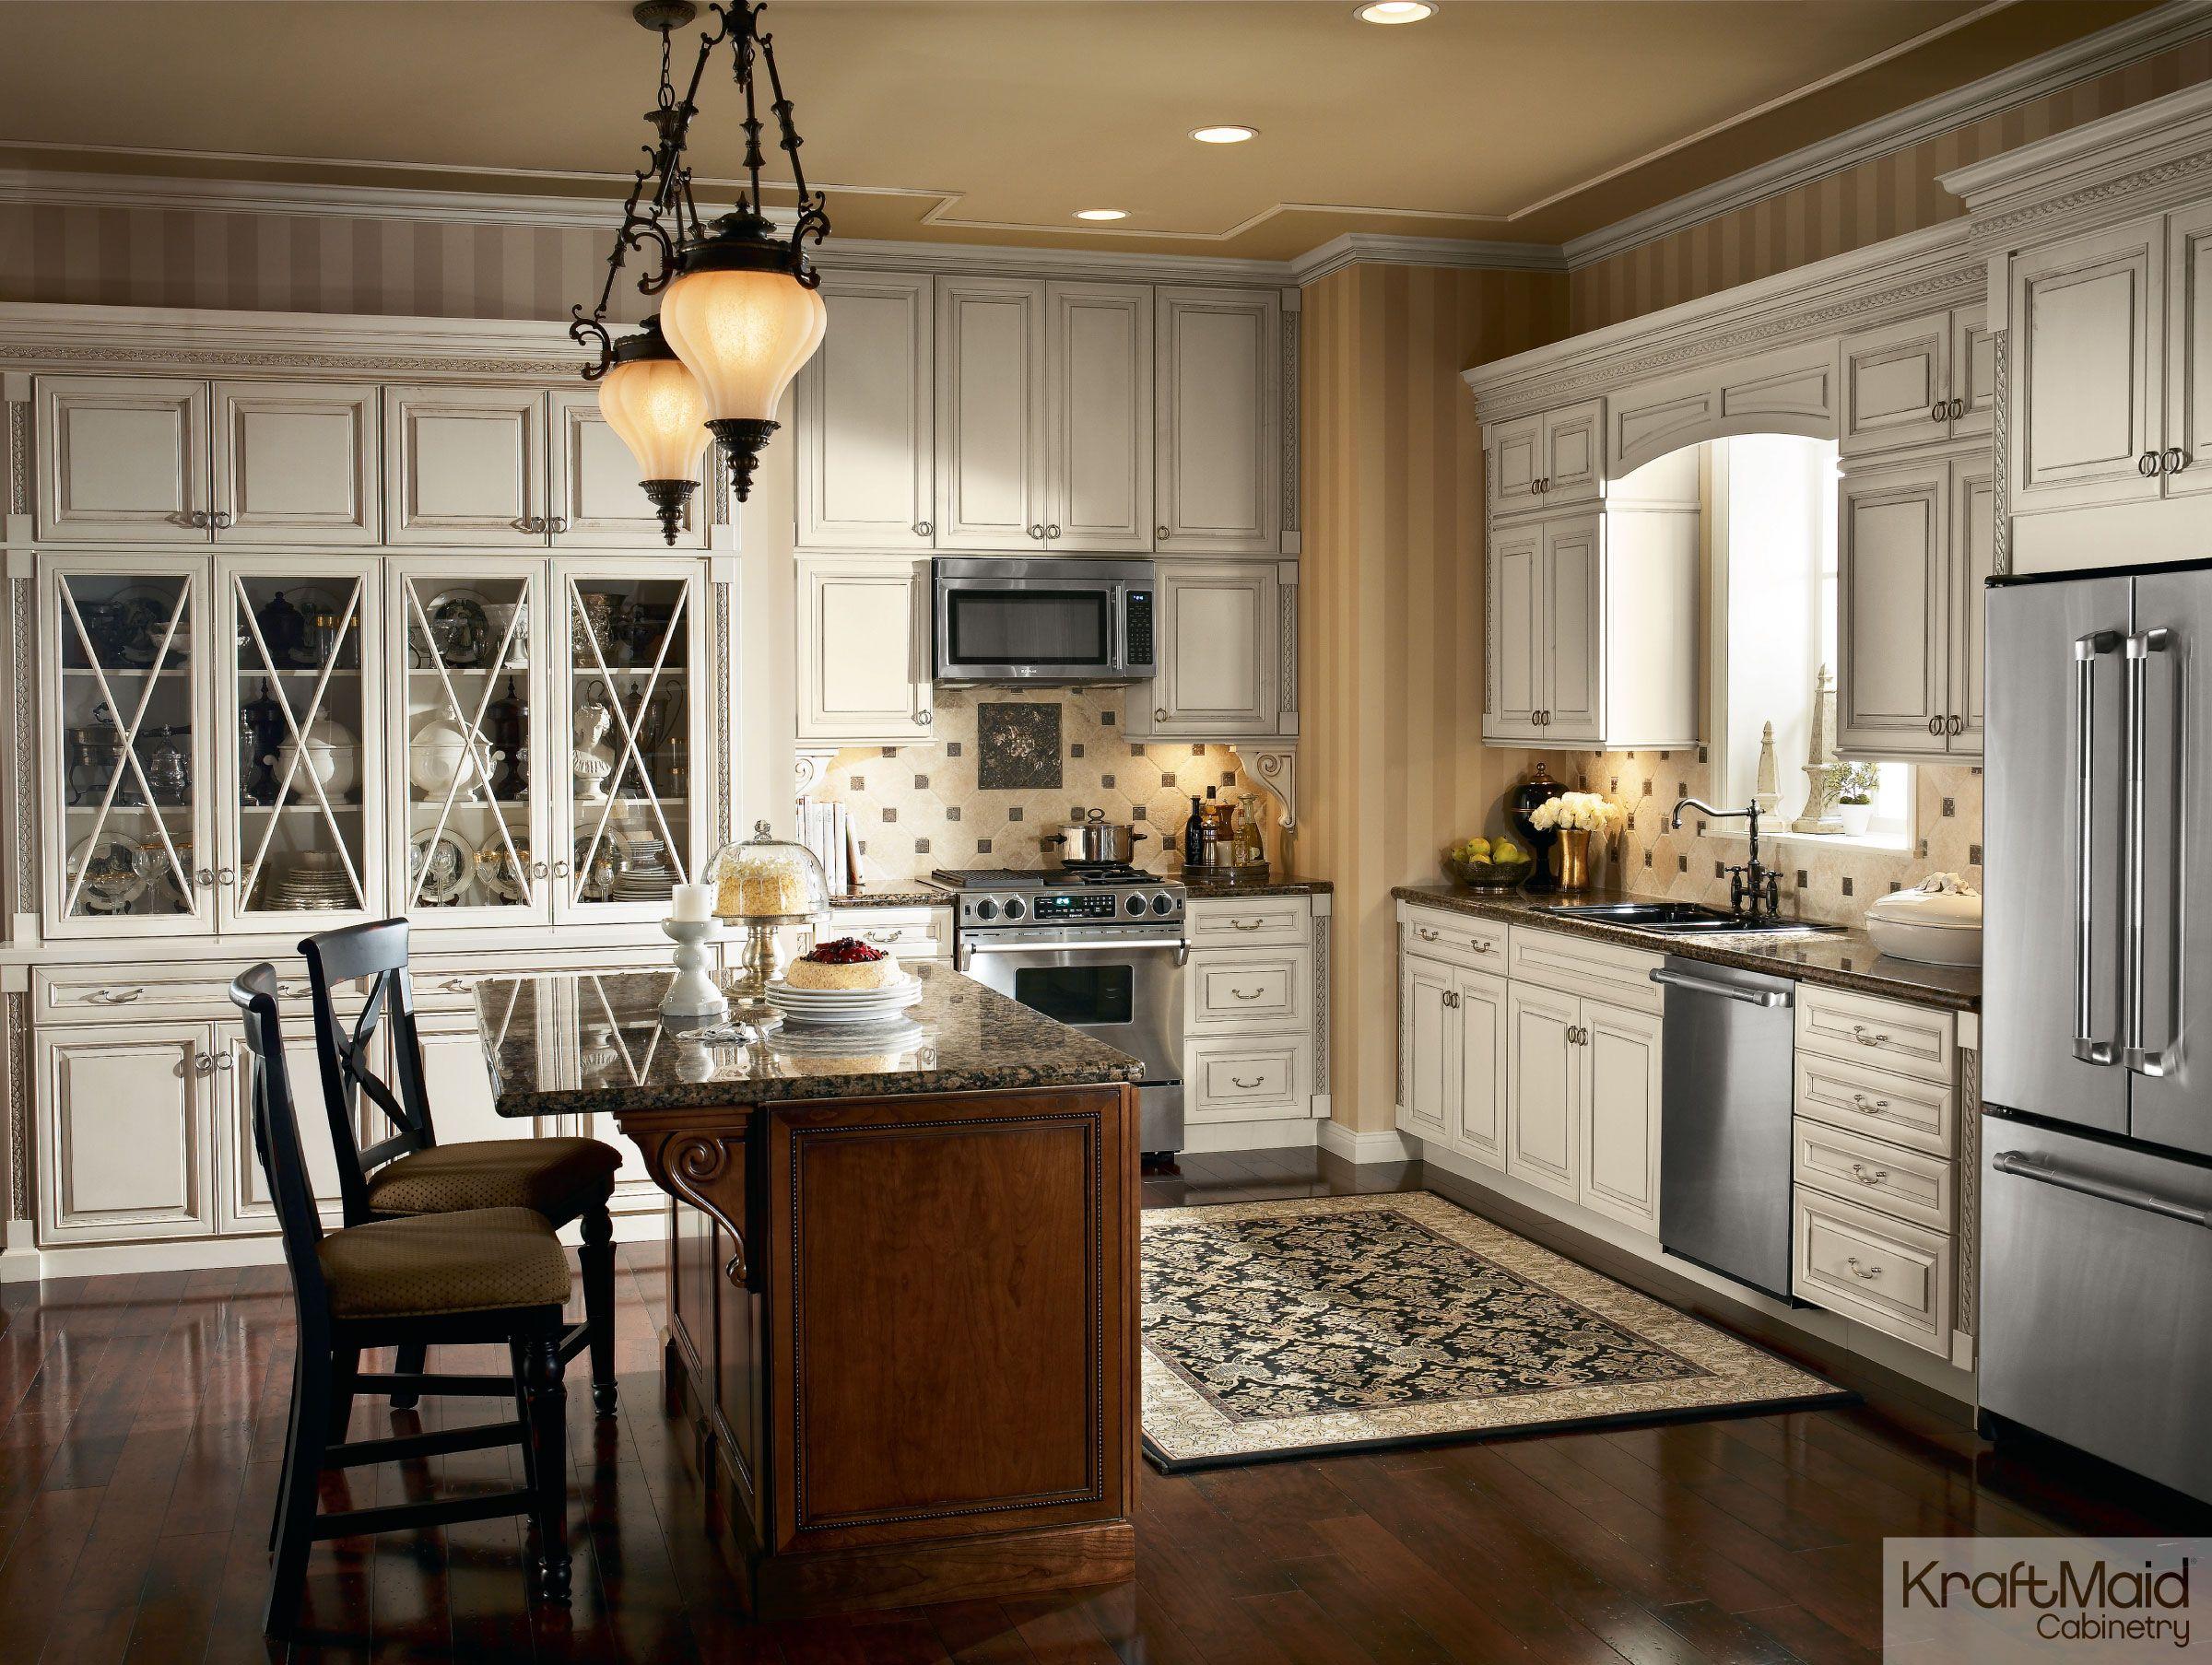 A Classic White Kraftmaid Kitchen Featuring A Warm Island